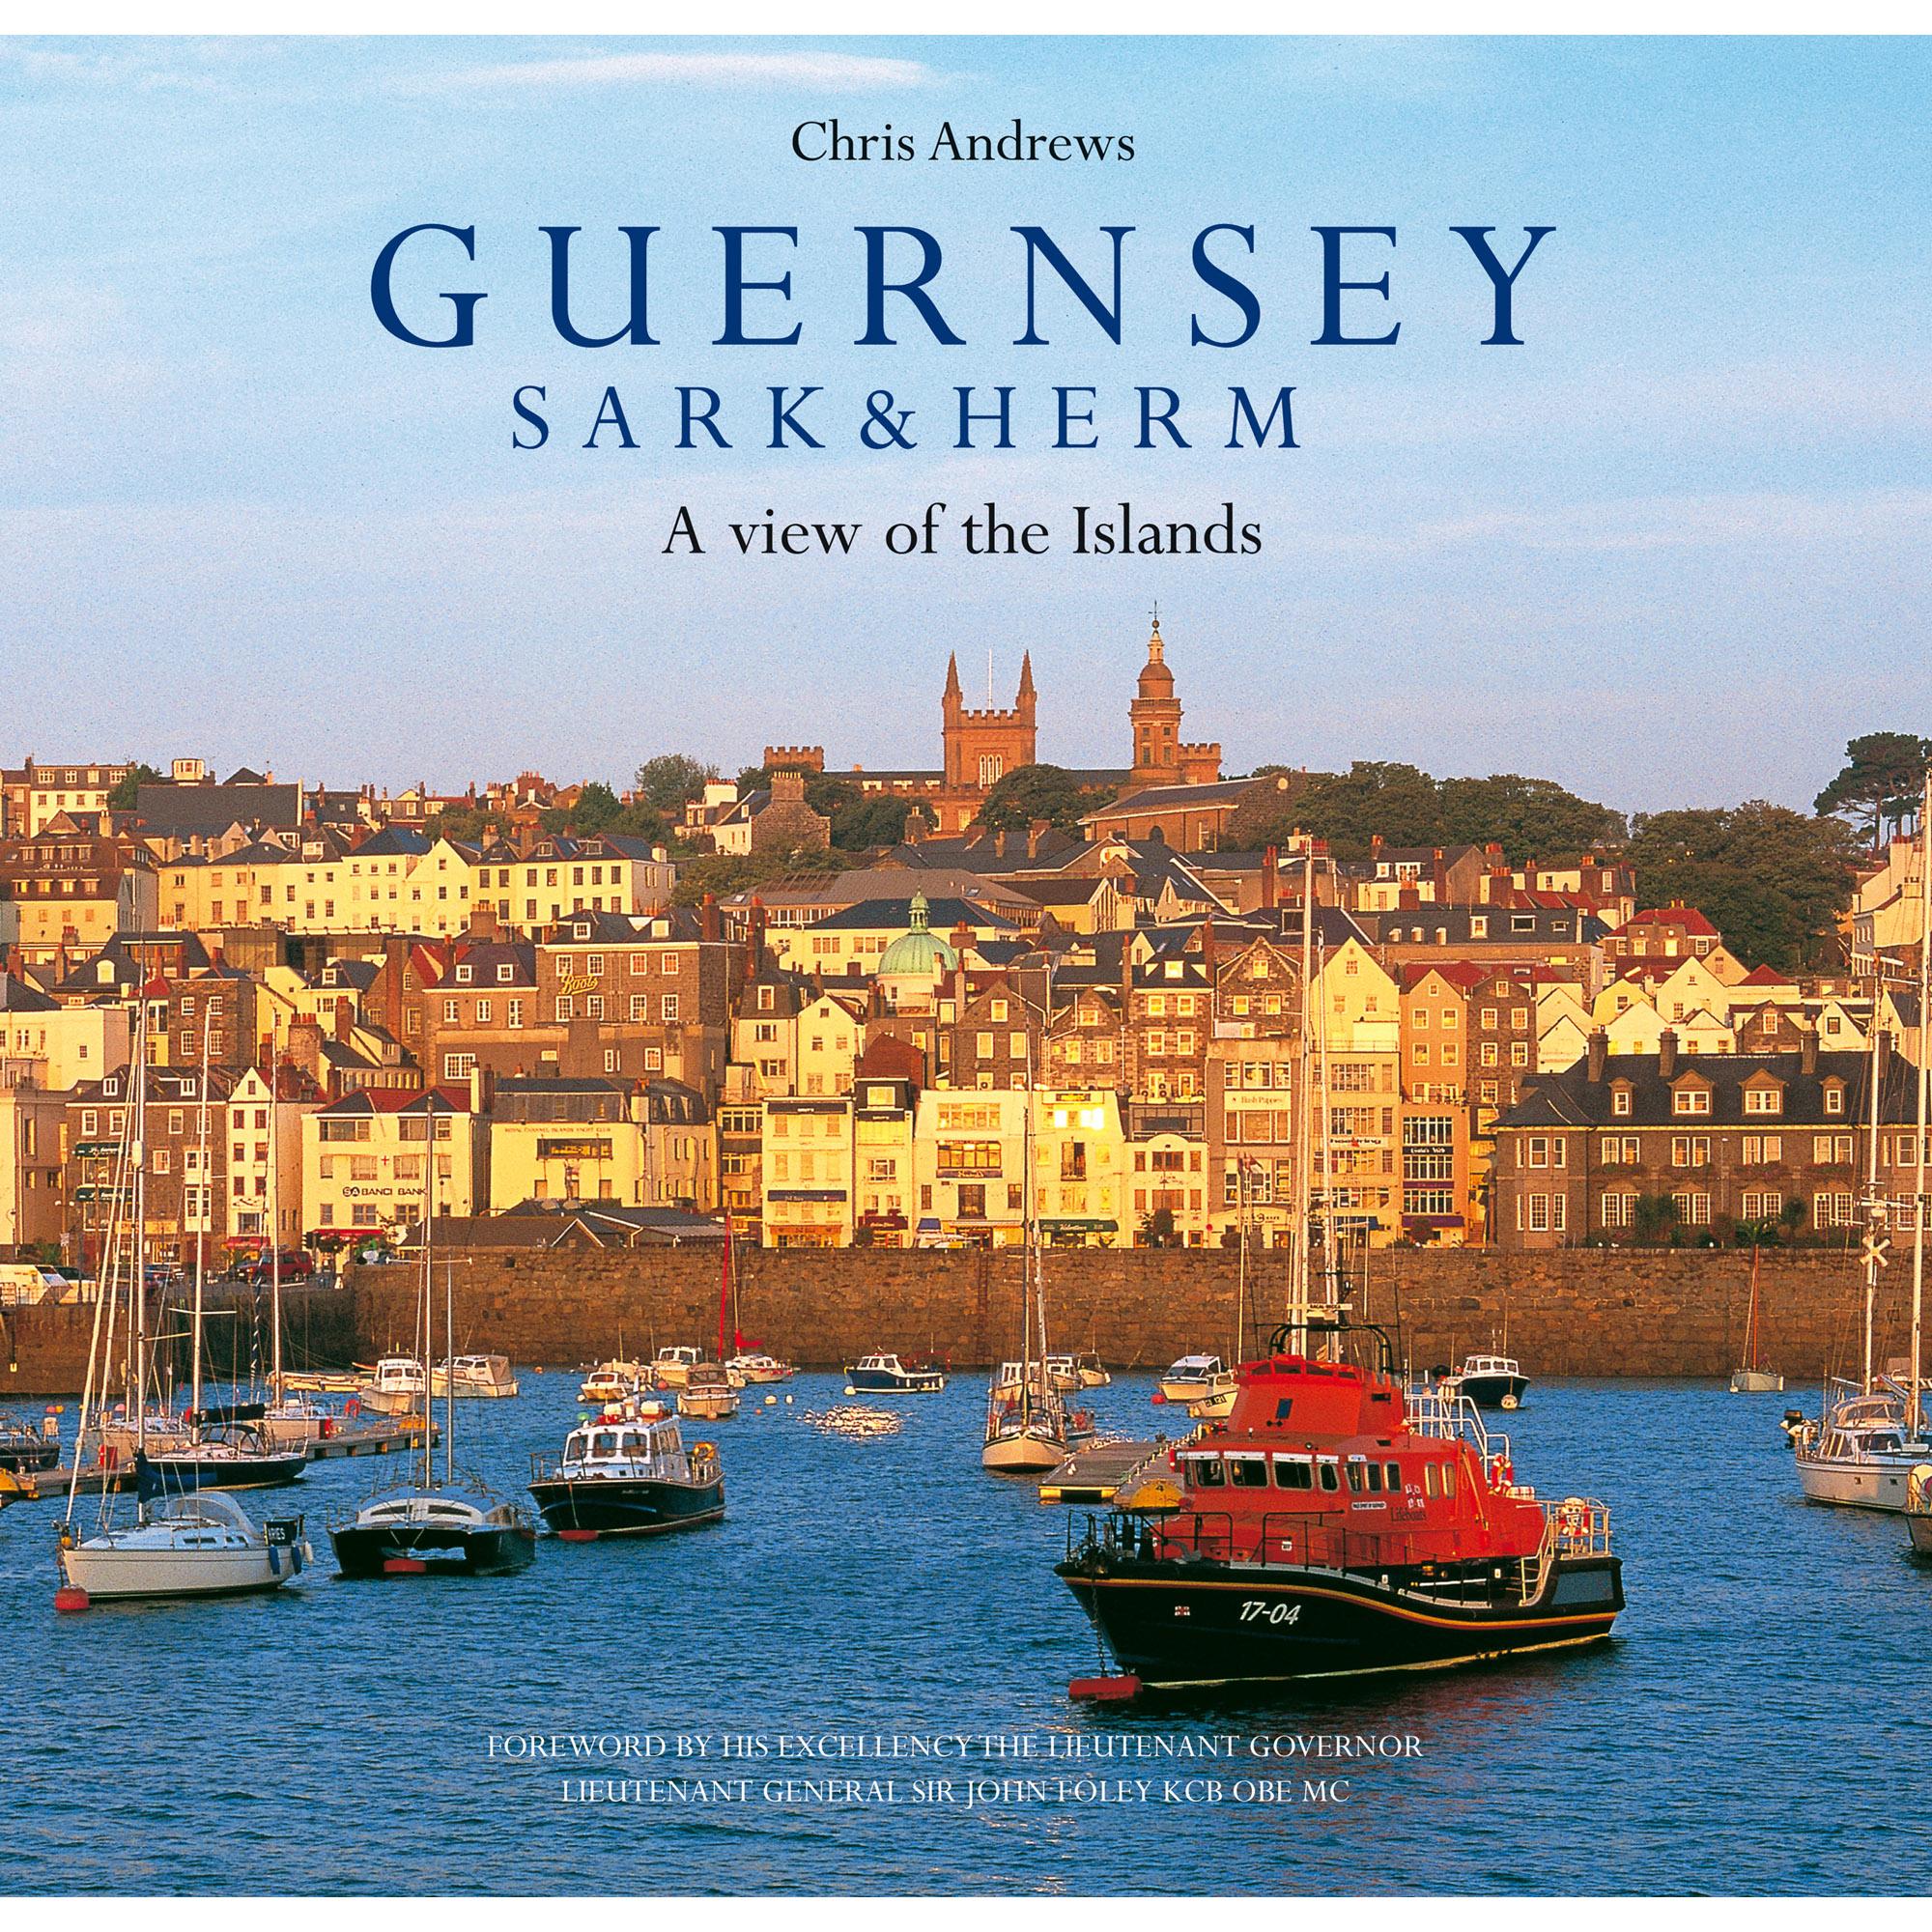 Guernsey Sark & Herm book - front cover